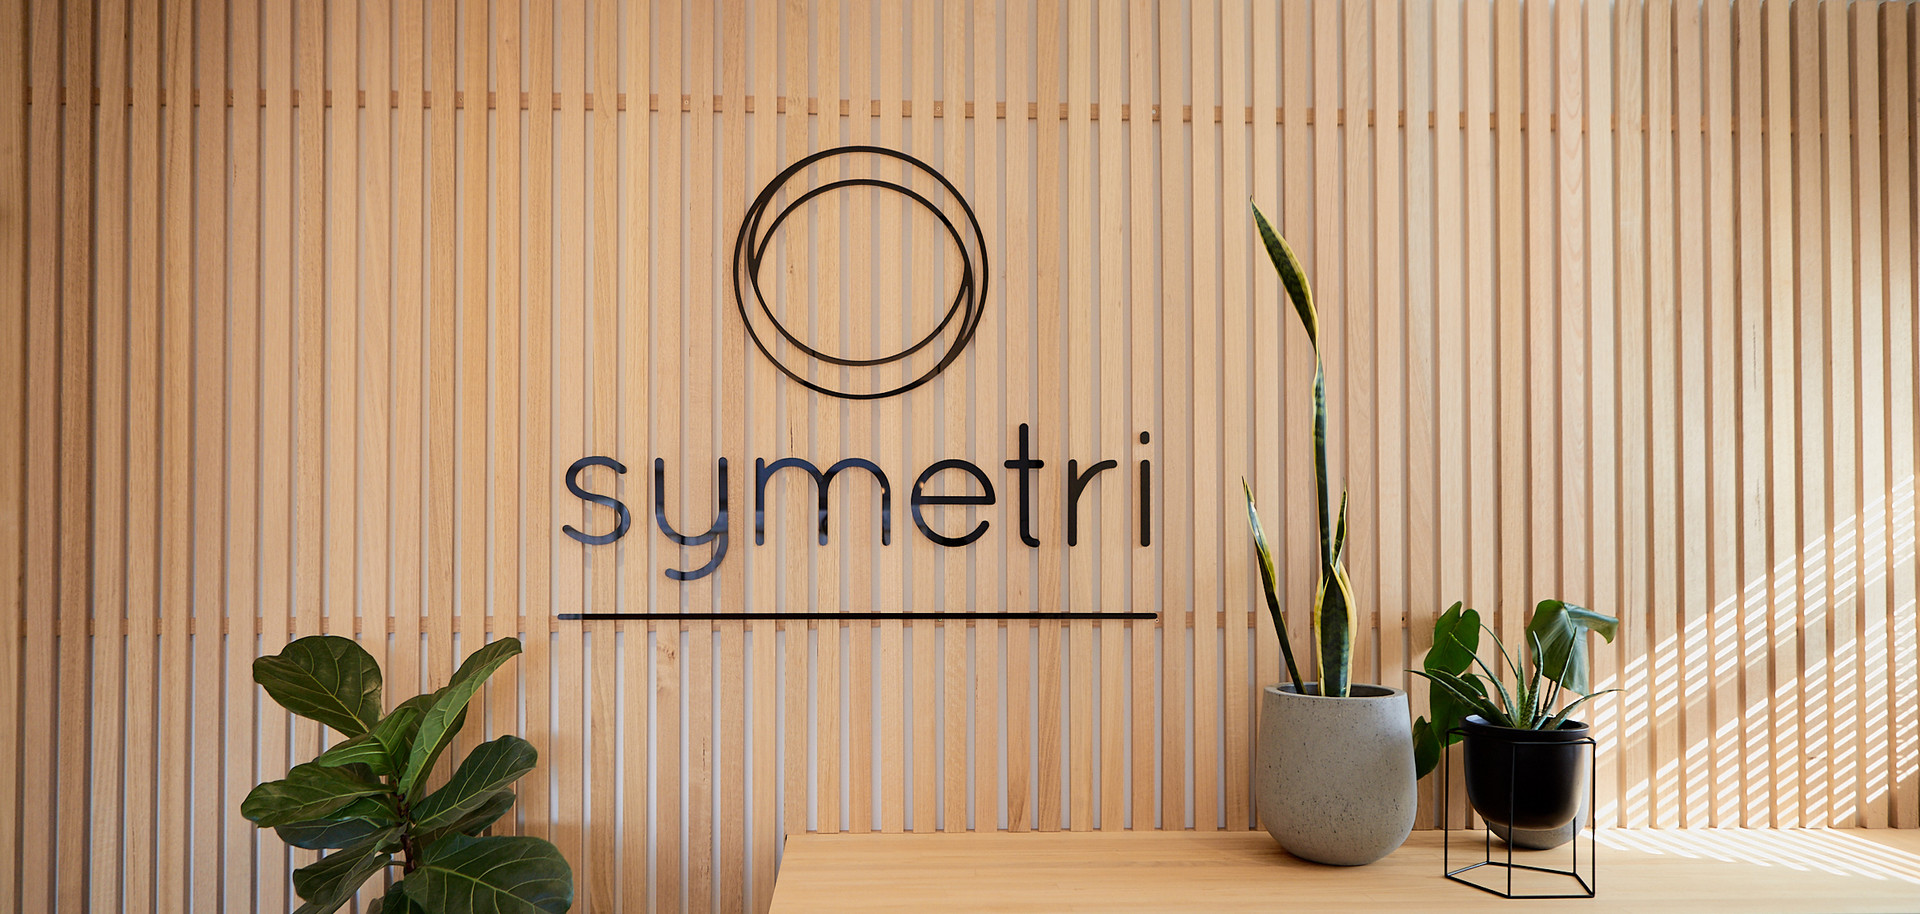 2019-SYMETRI-077.jpg